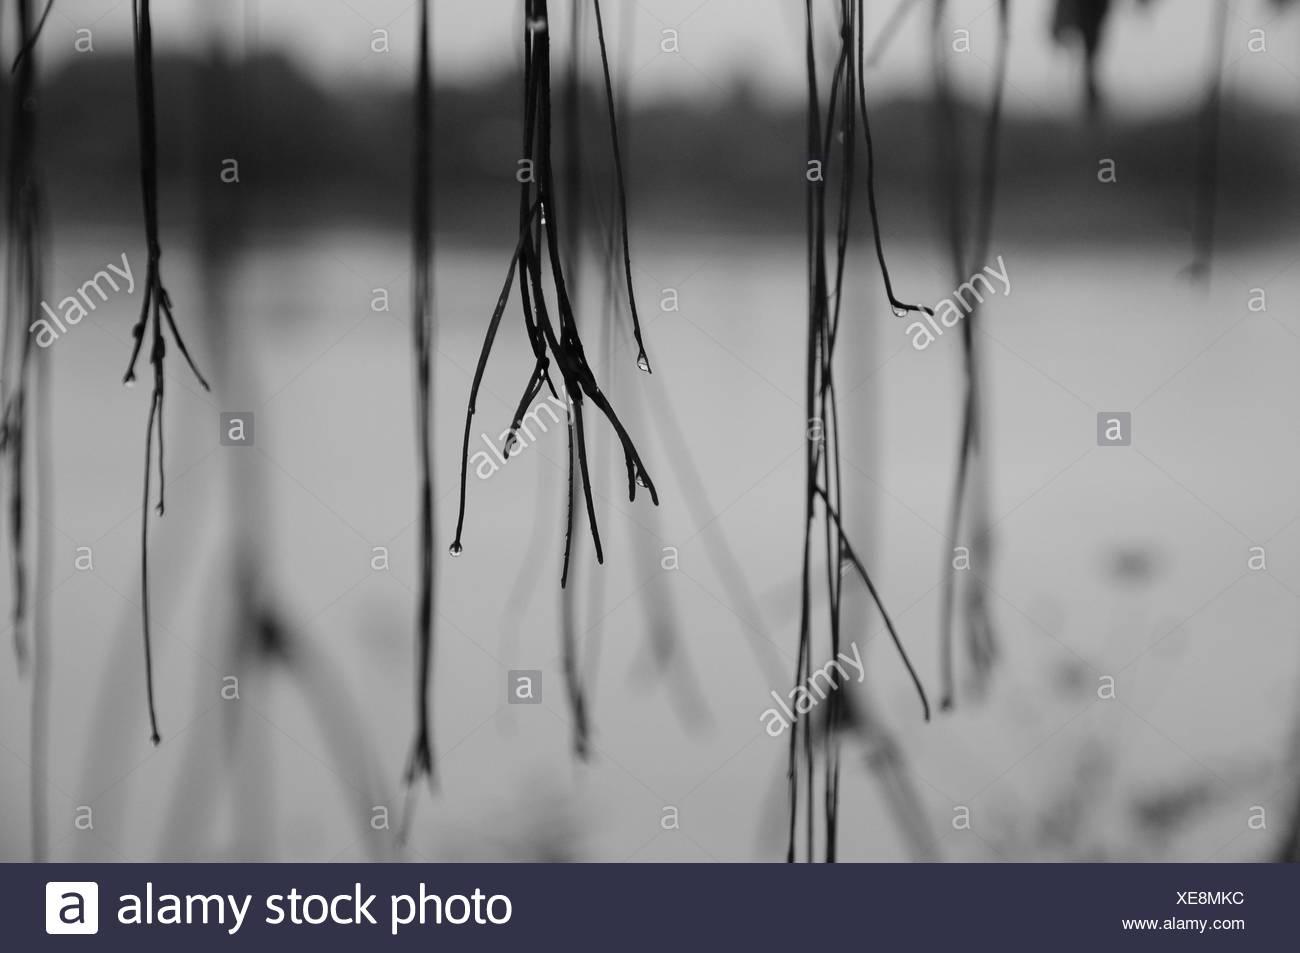 Wet Dead Plants During Rainy Season - Stock Image